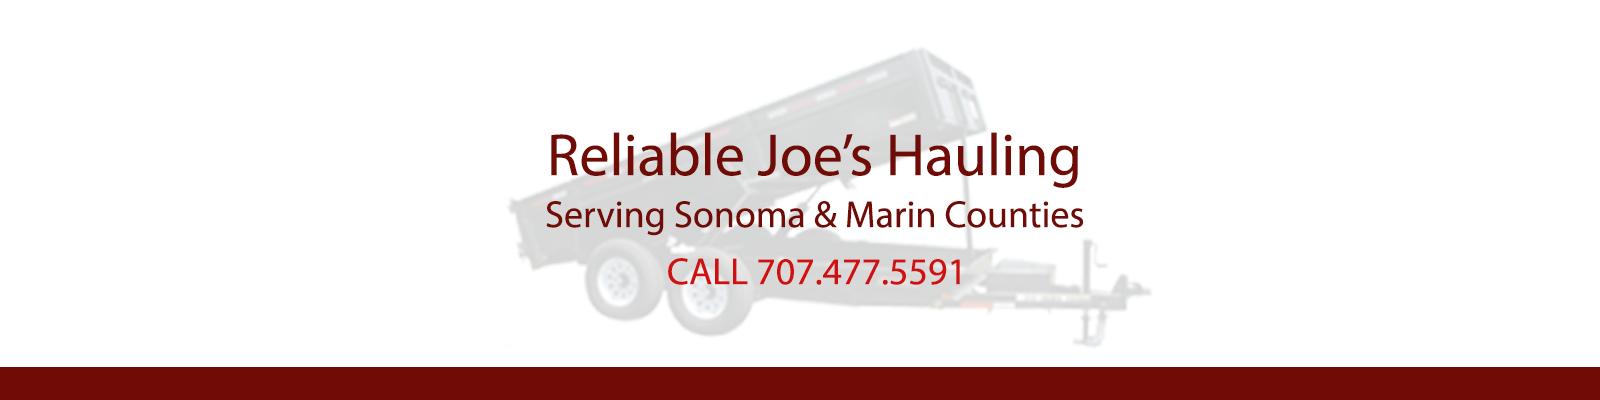 Sonoma County Junk Removal, Hauling, Dump Runs